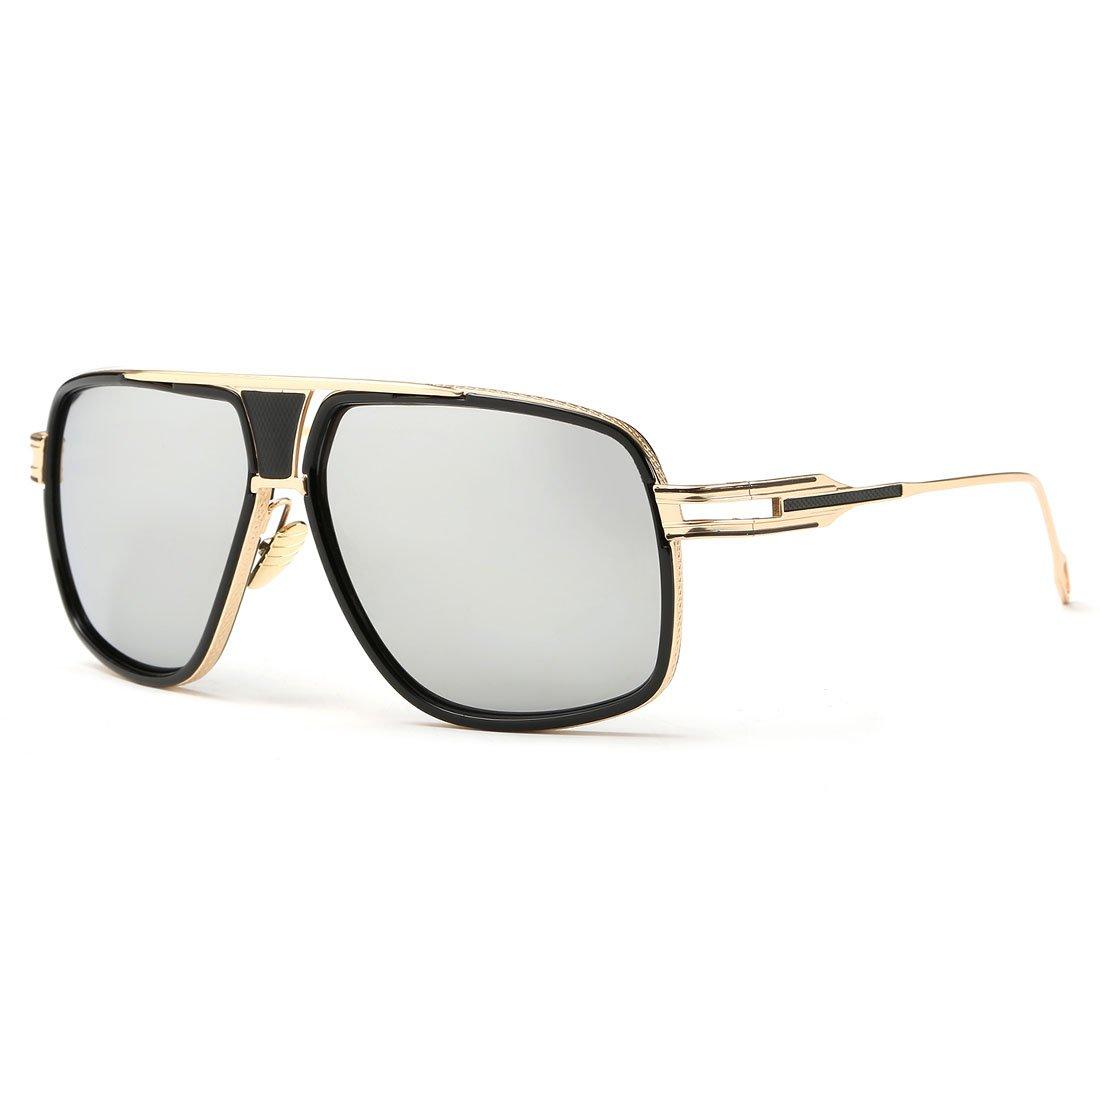 kimorn Sonnenbrille für Herren Retro Goggle Metallrahmen Classic Eyewear AE0336 62) k0336-7